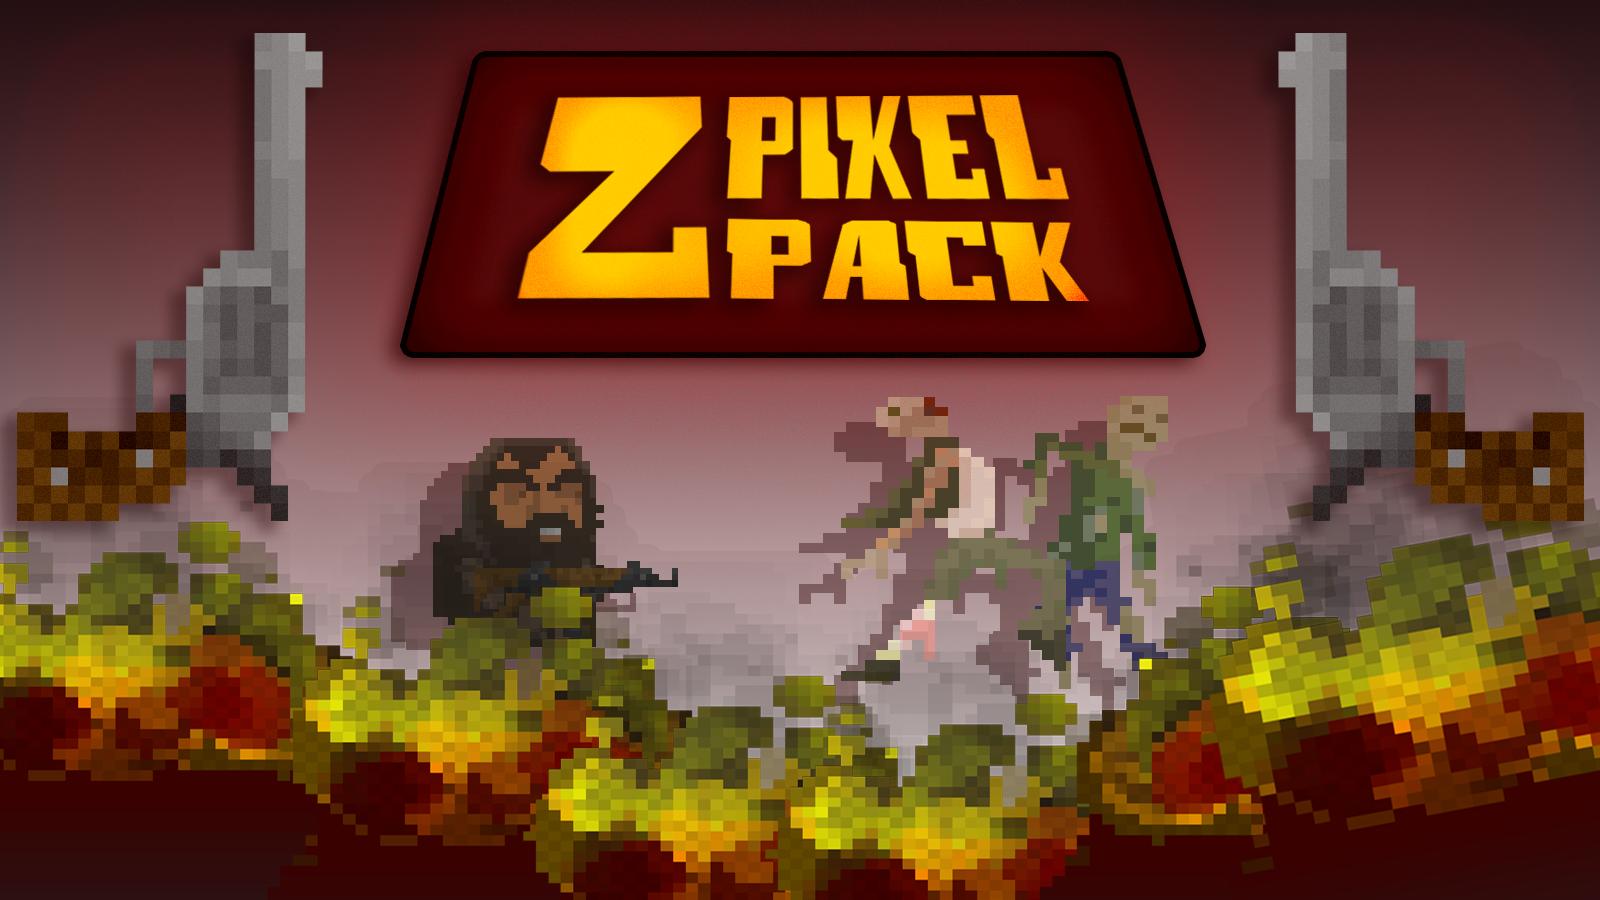 Z Pixel Pack